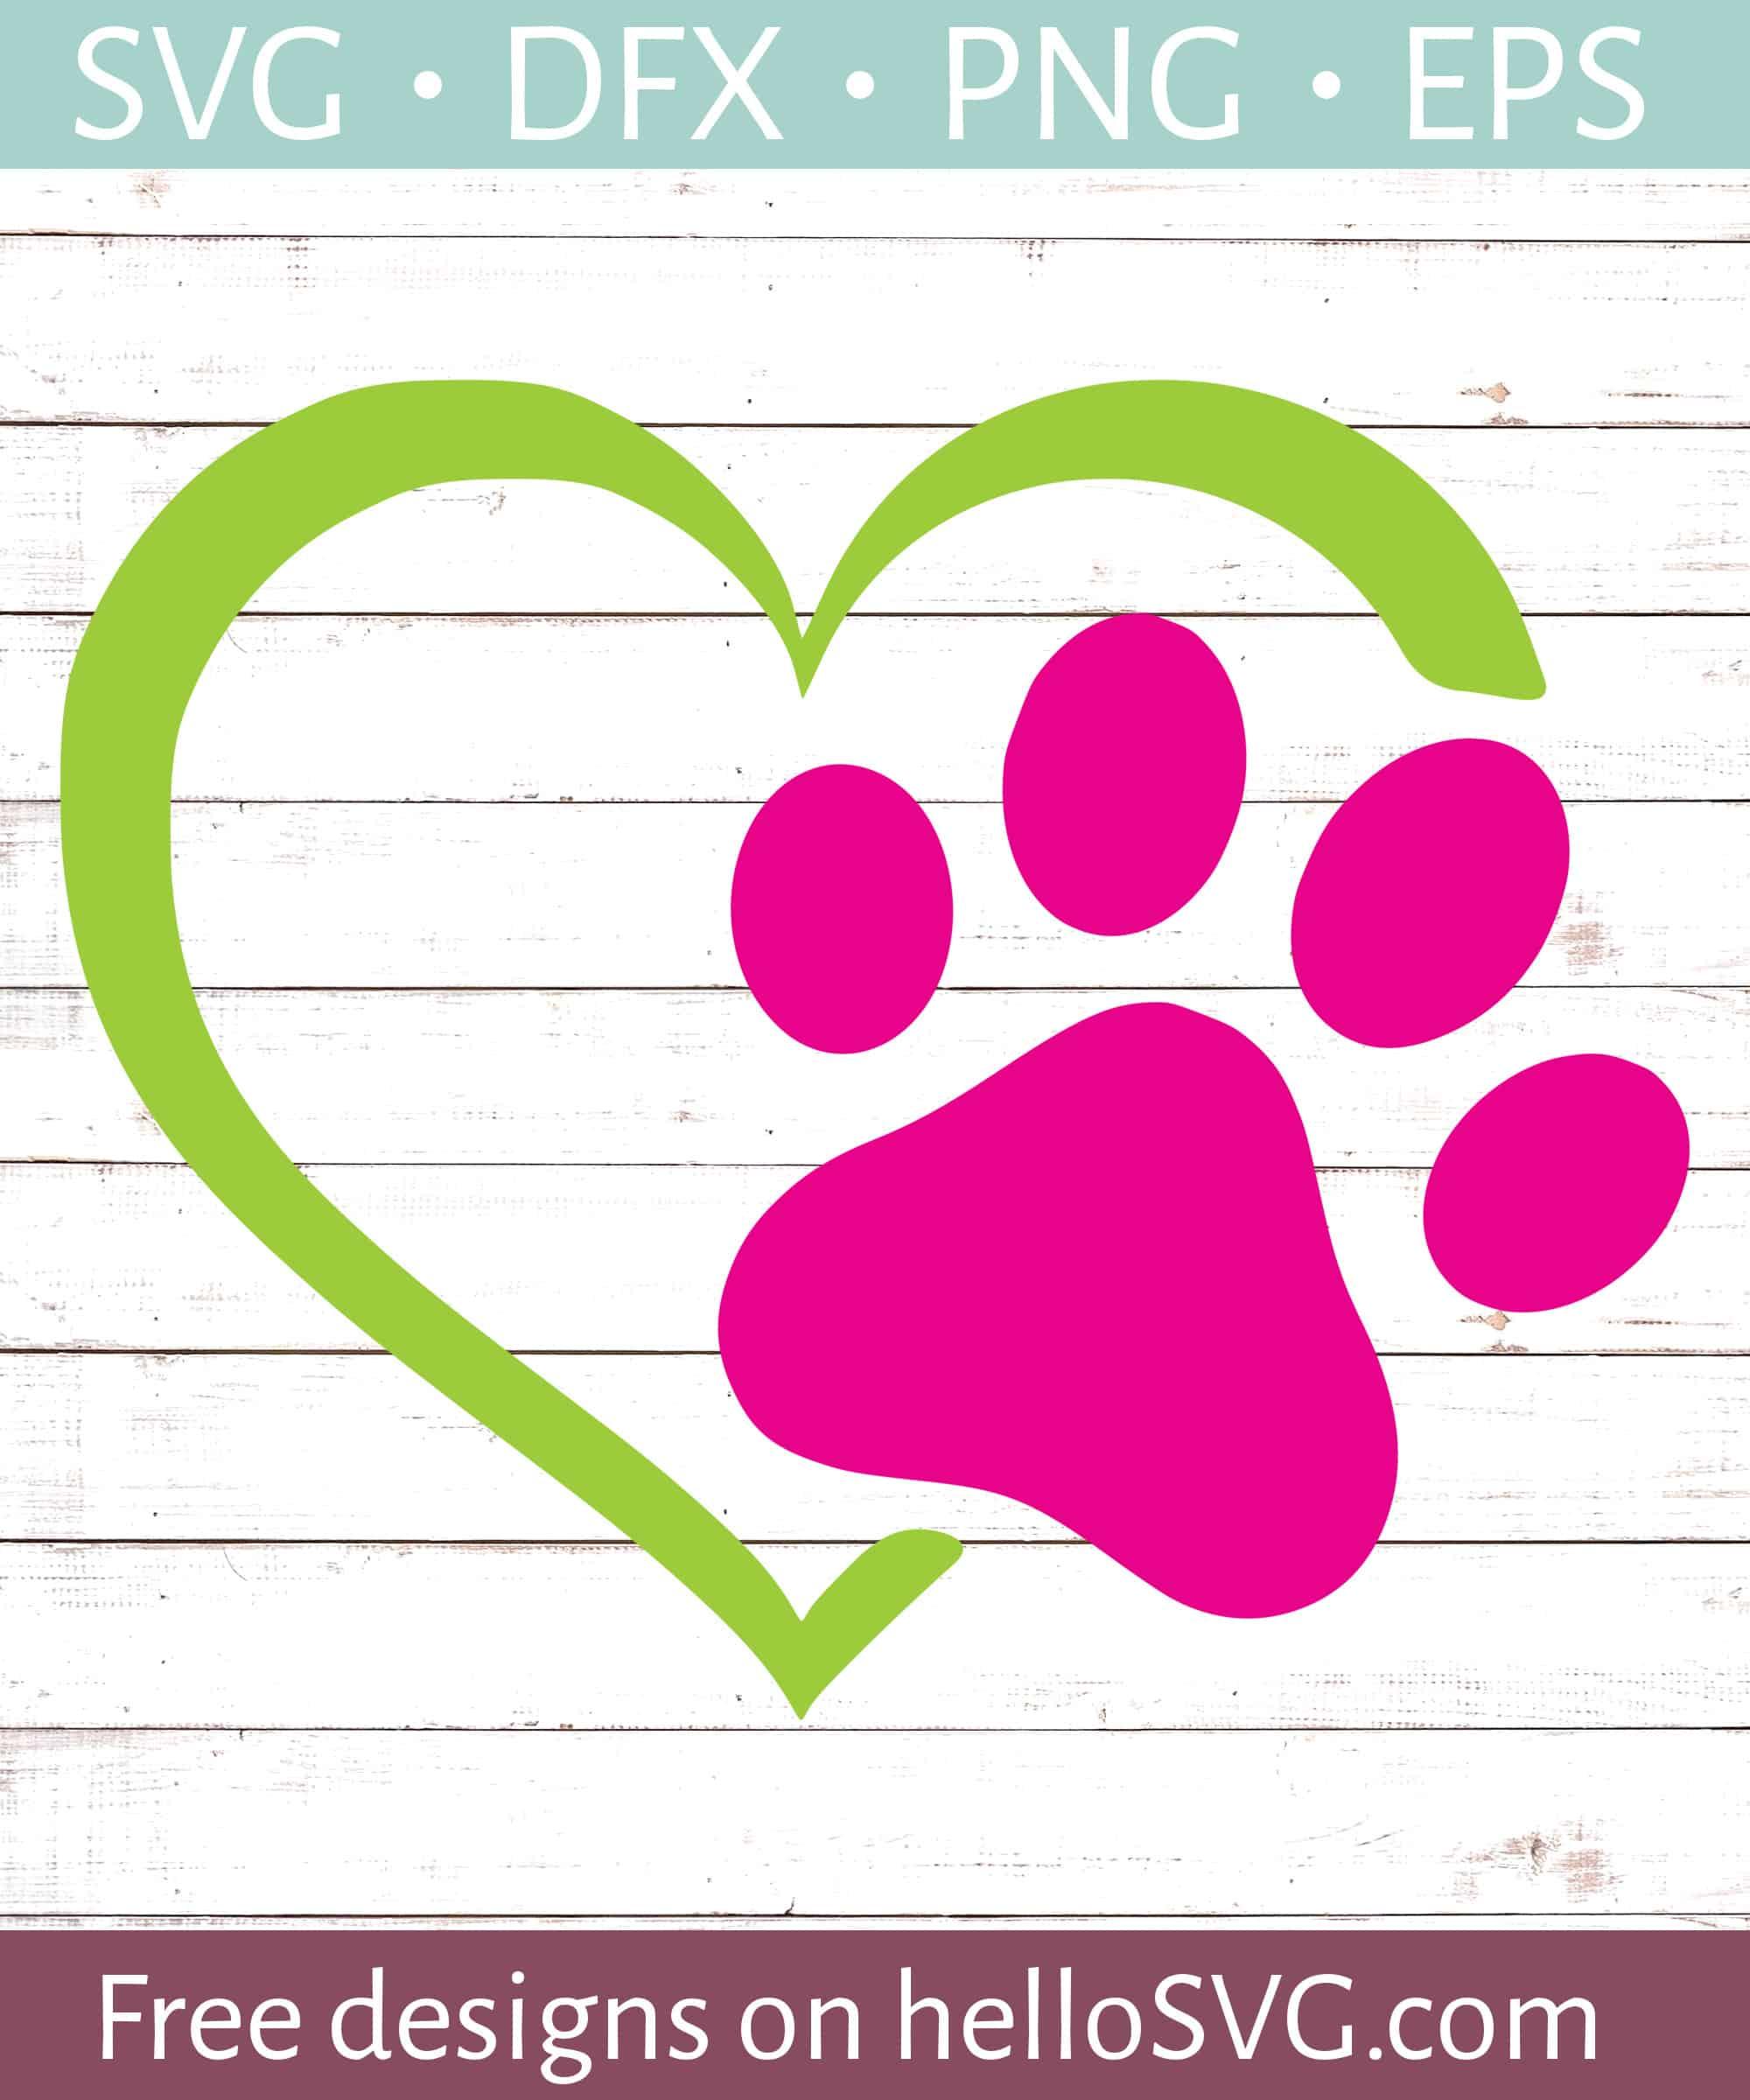 Dog Paw Svg Free : Heart, Prints, Files, HelloSVG.com